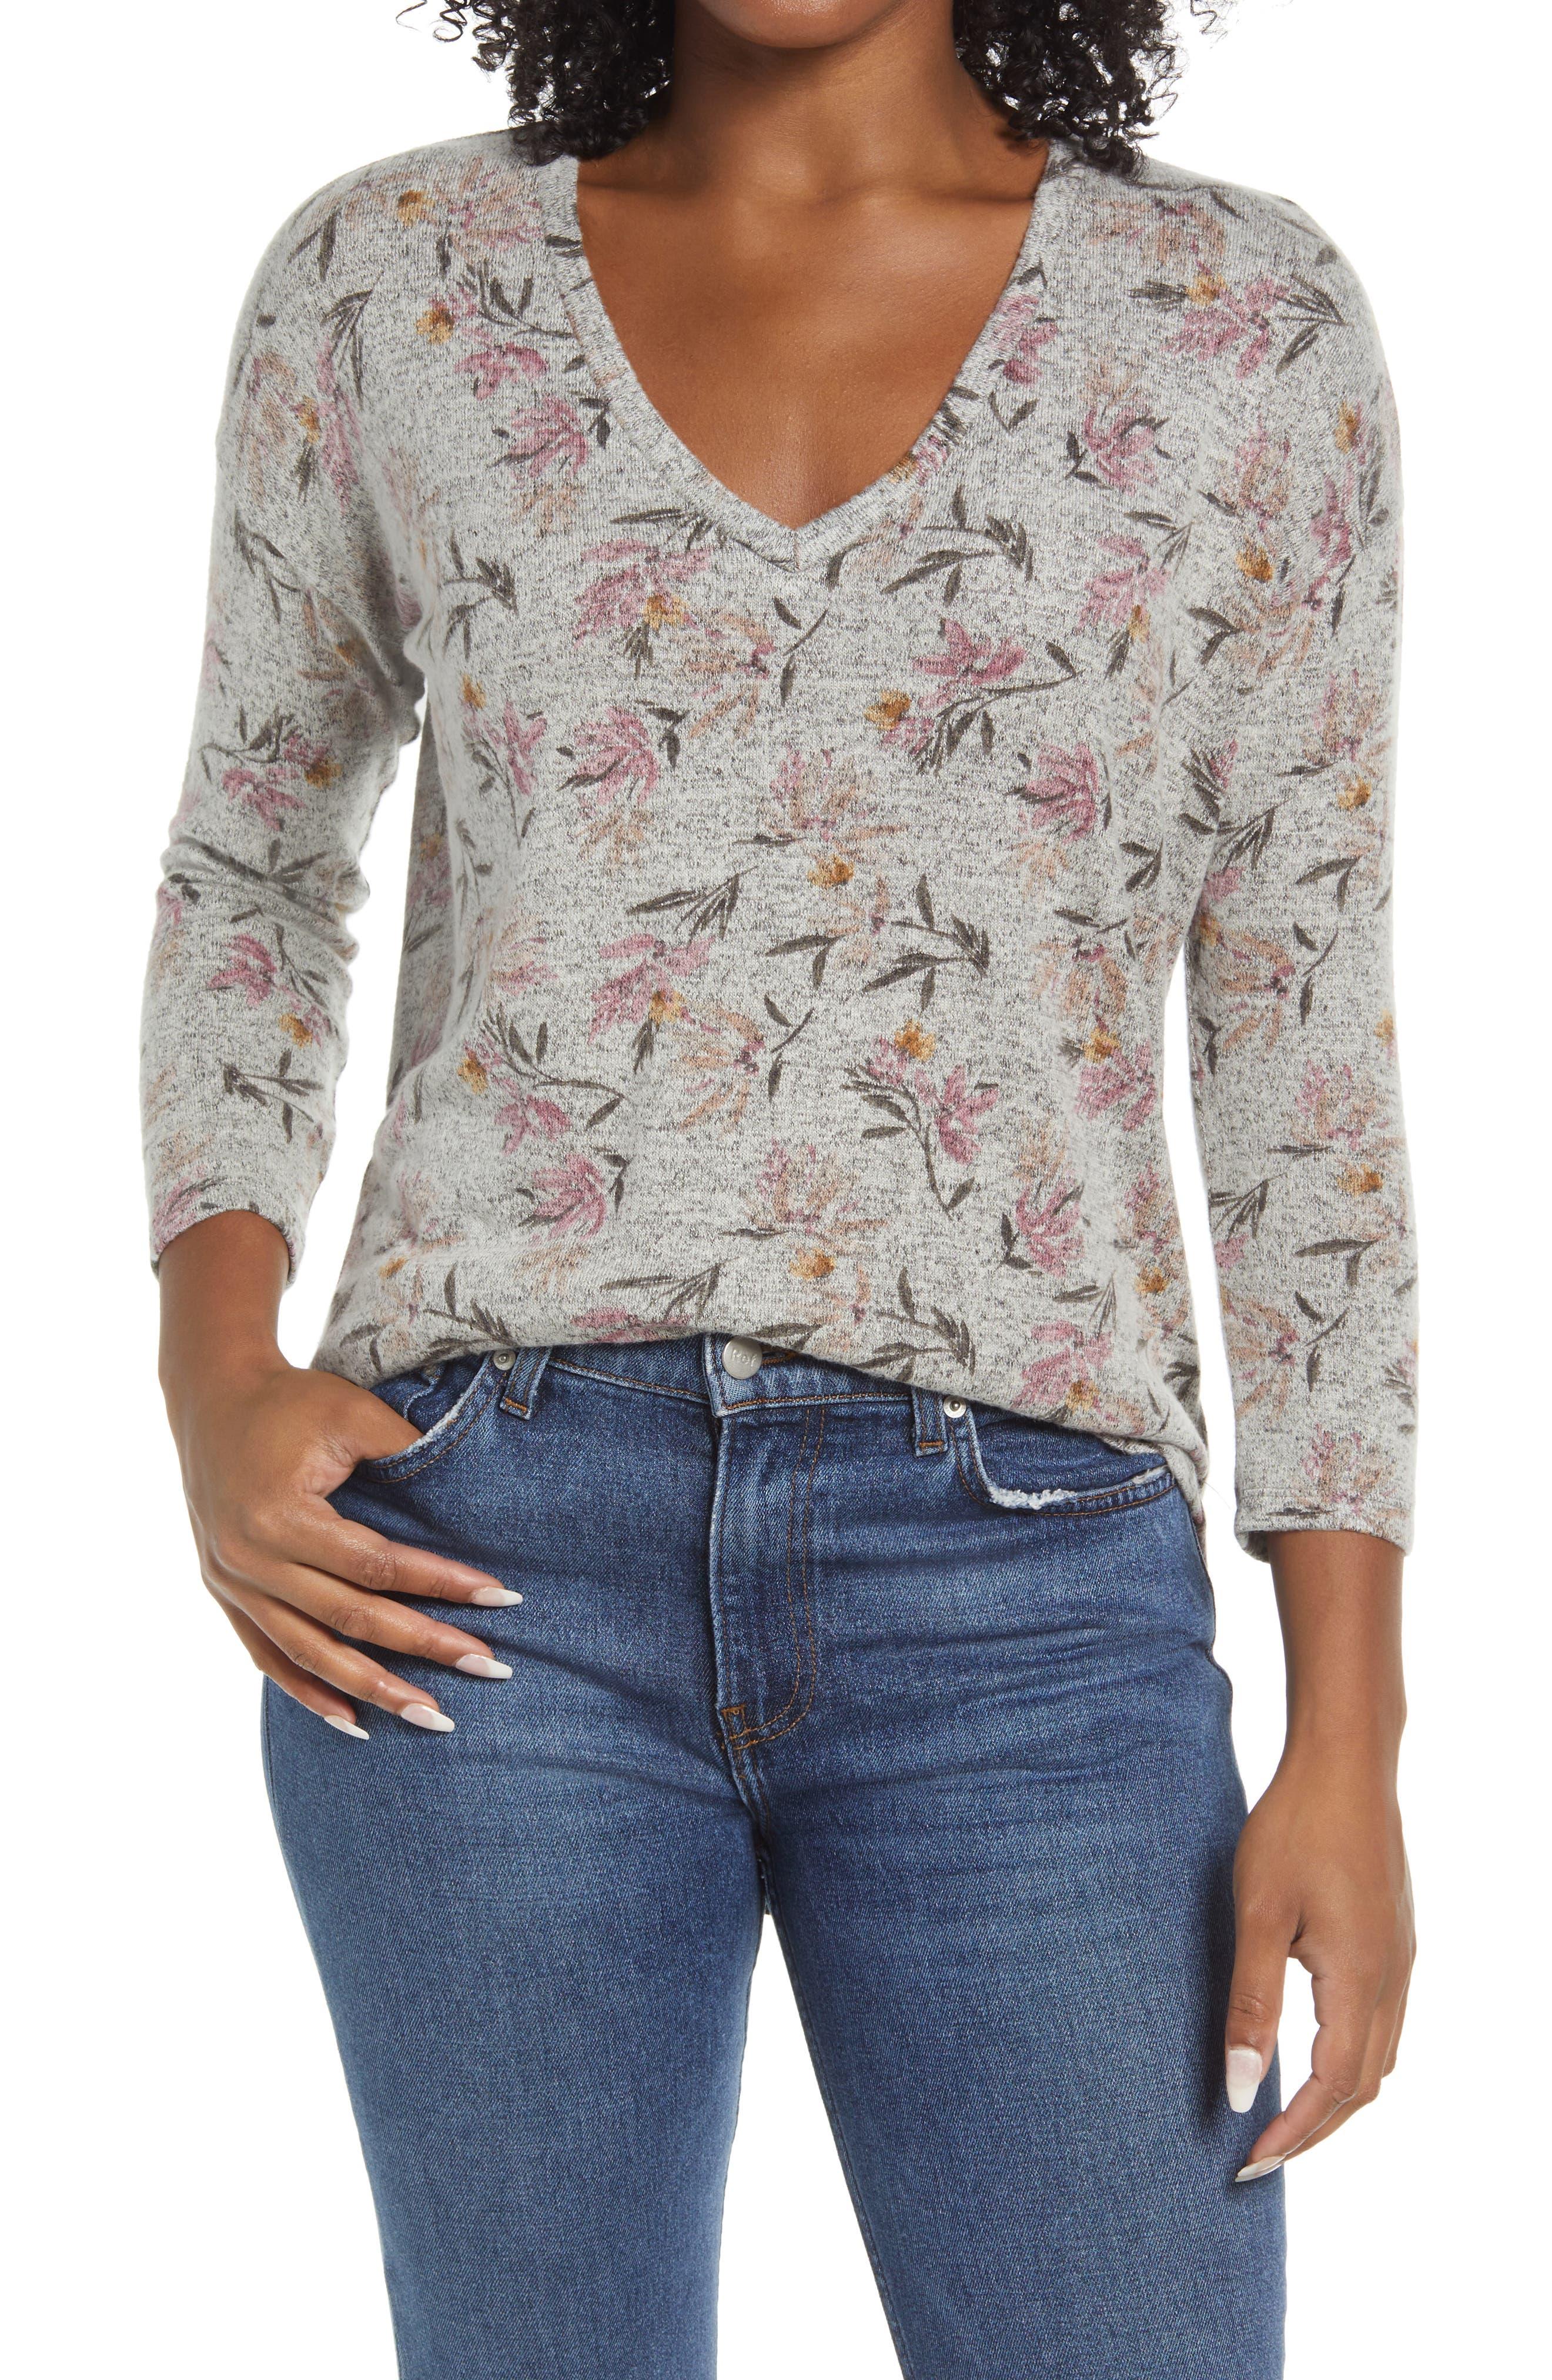 Cozy Shirttail Top